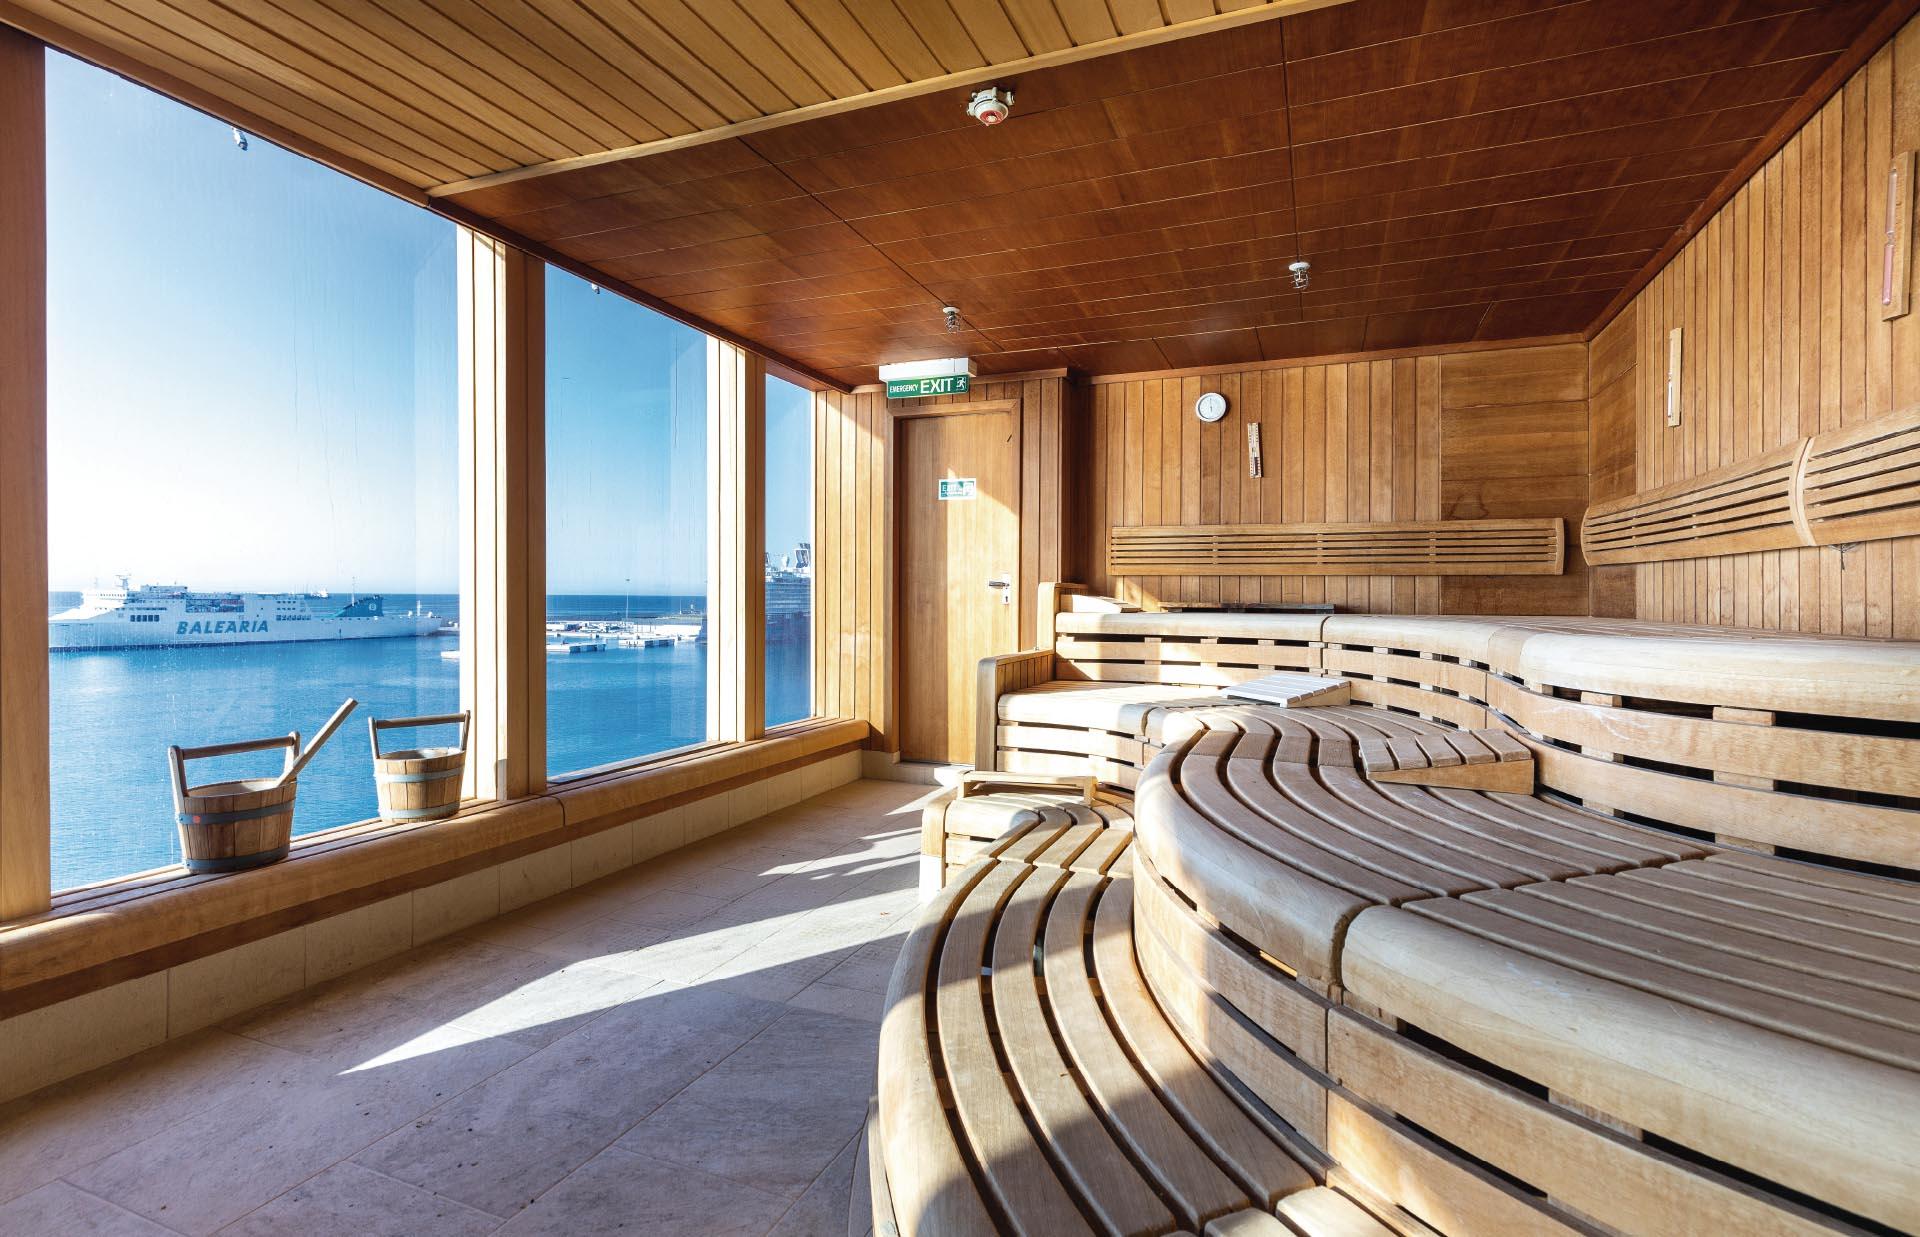 Tui_Marella-cruiseship-Butterscotch-Design-Marine-Spa-Sauna